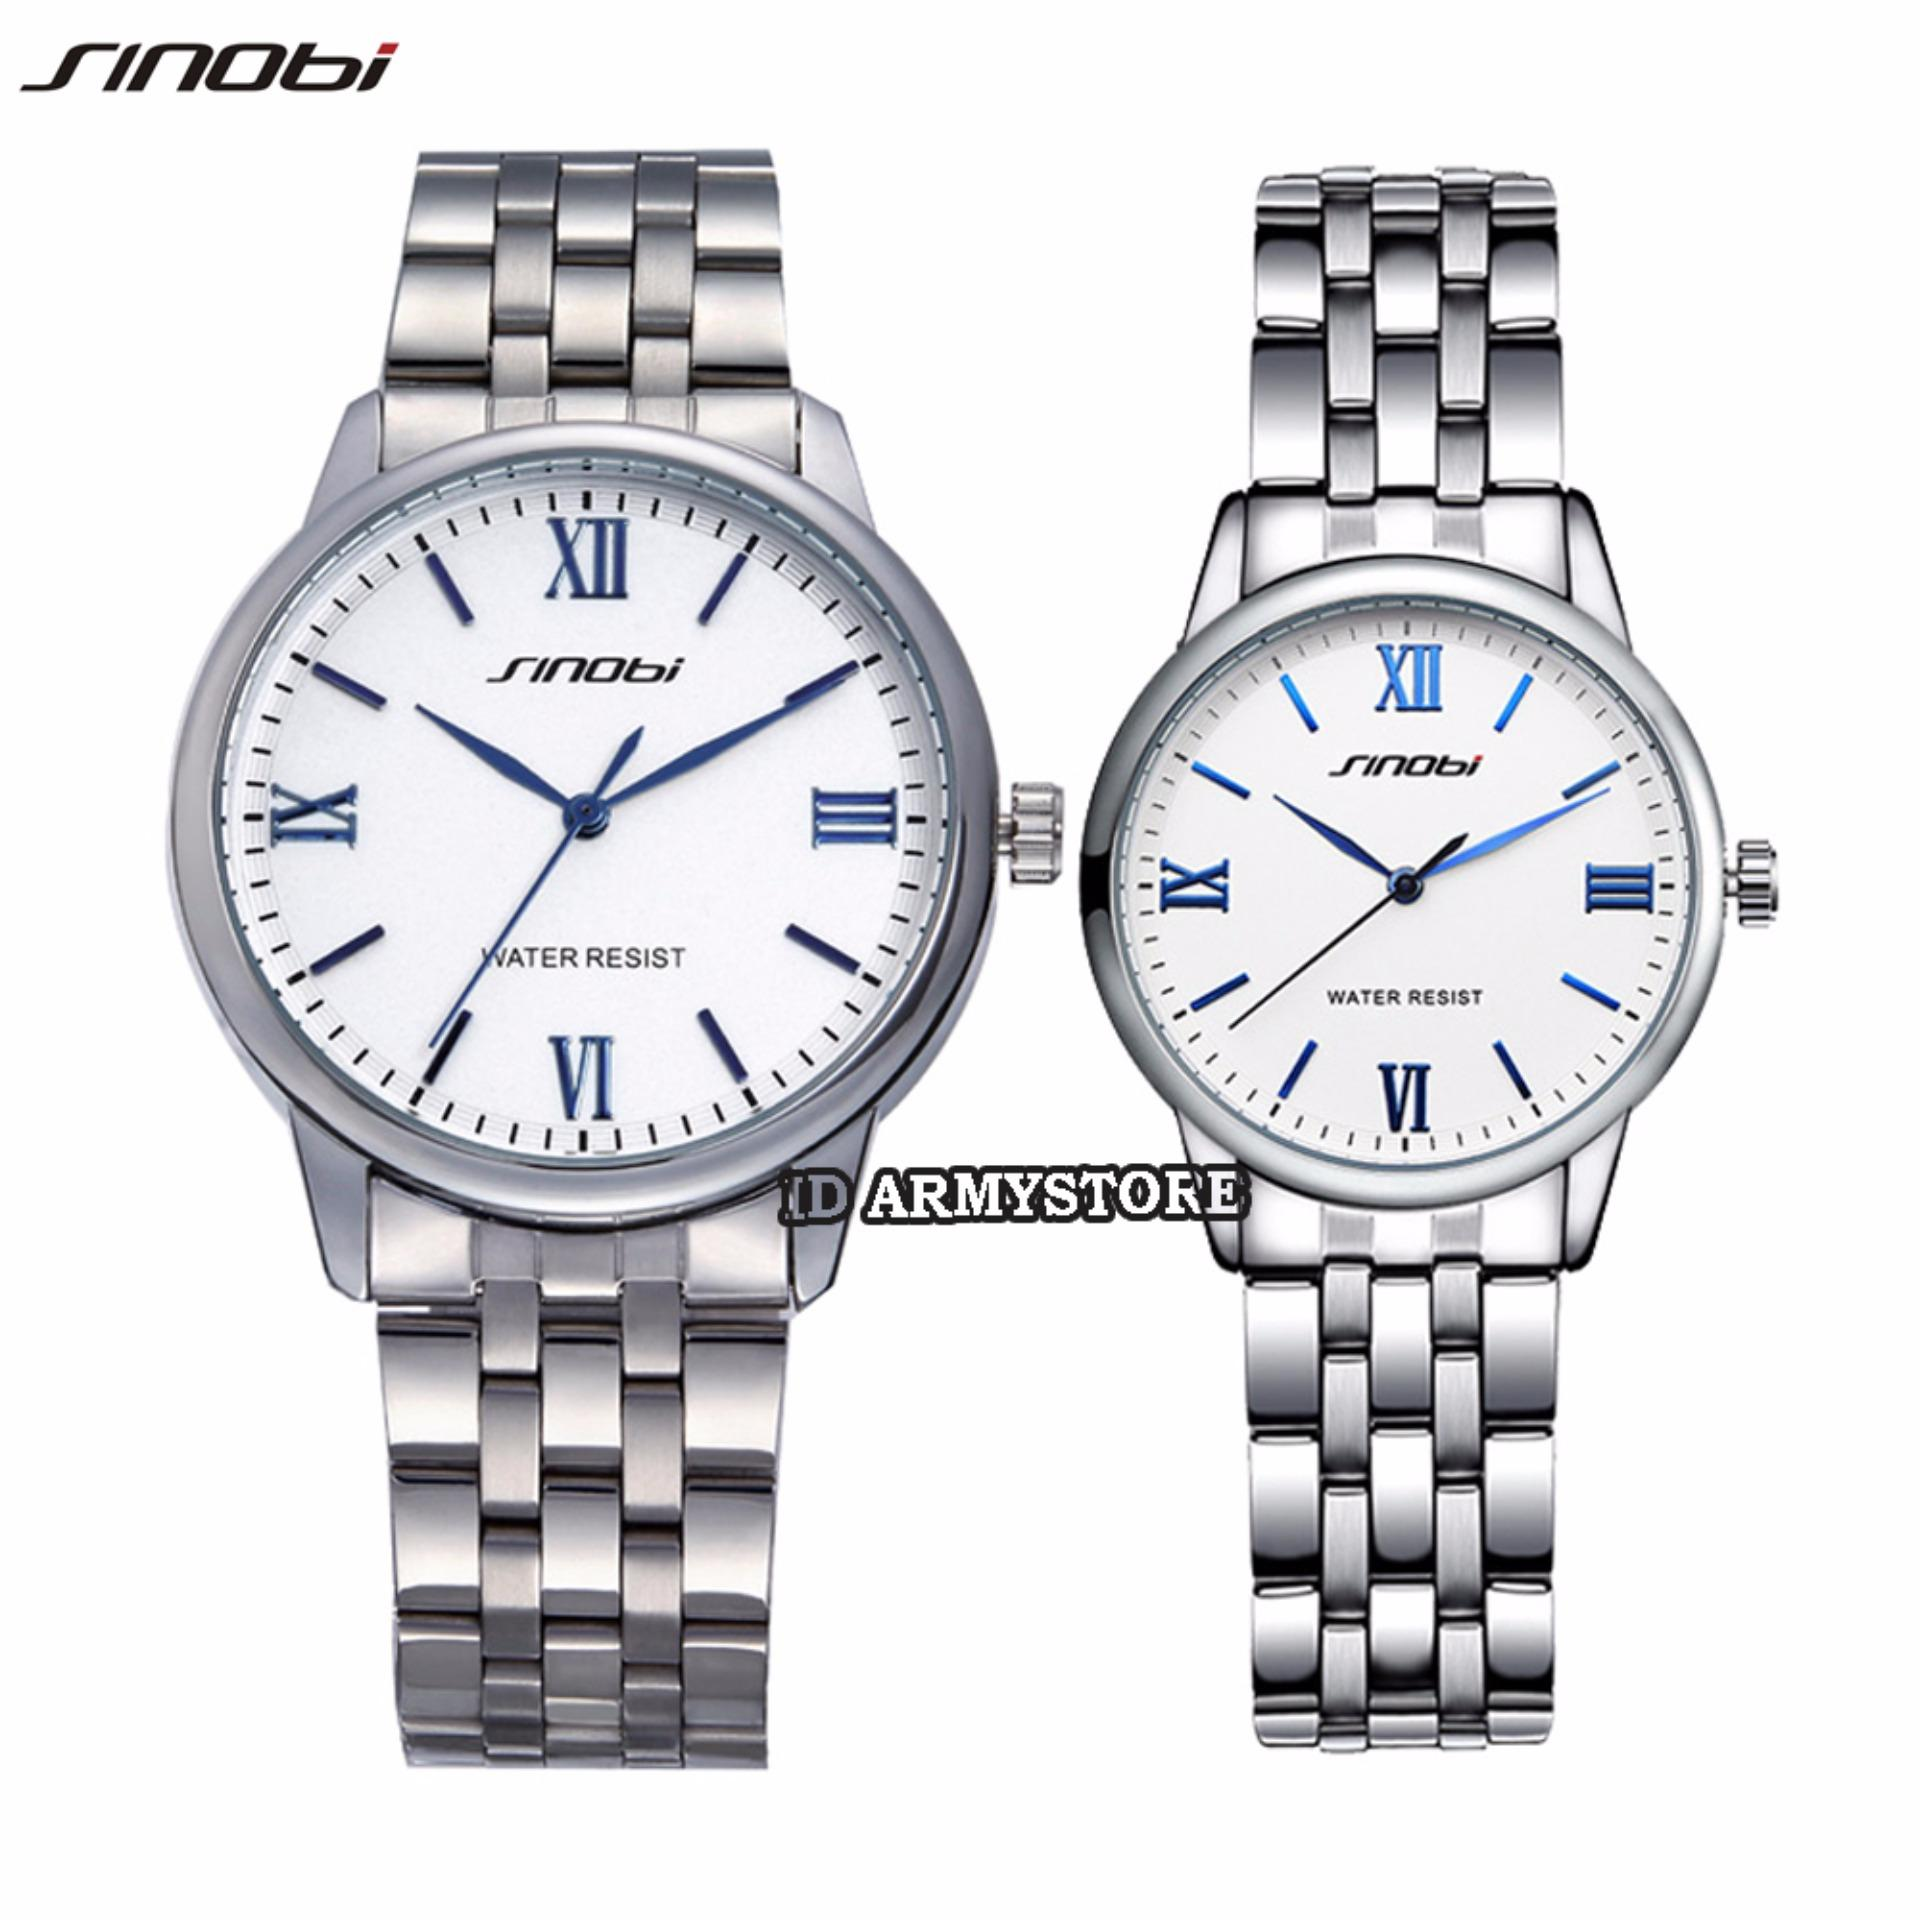 Sinobi 9445G02 - Jam Tangan Analog Couple - Stainless Silver - Dial Putih .